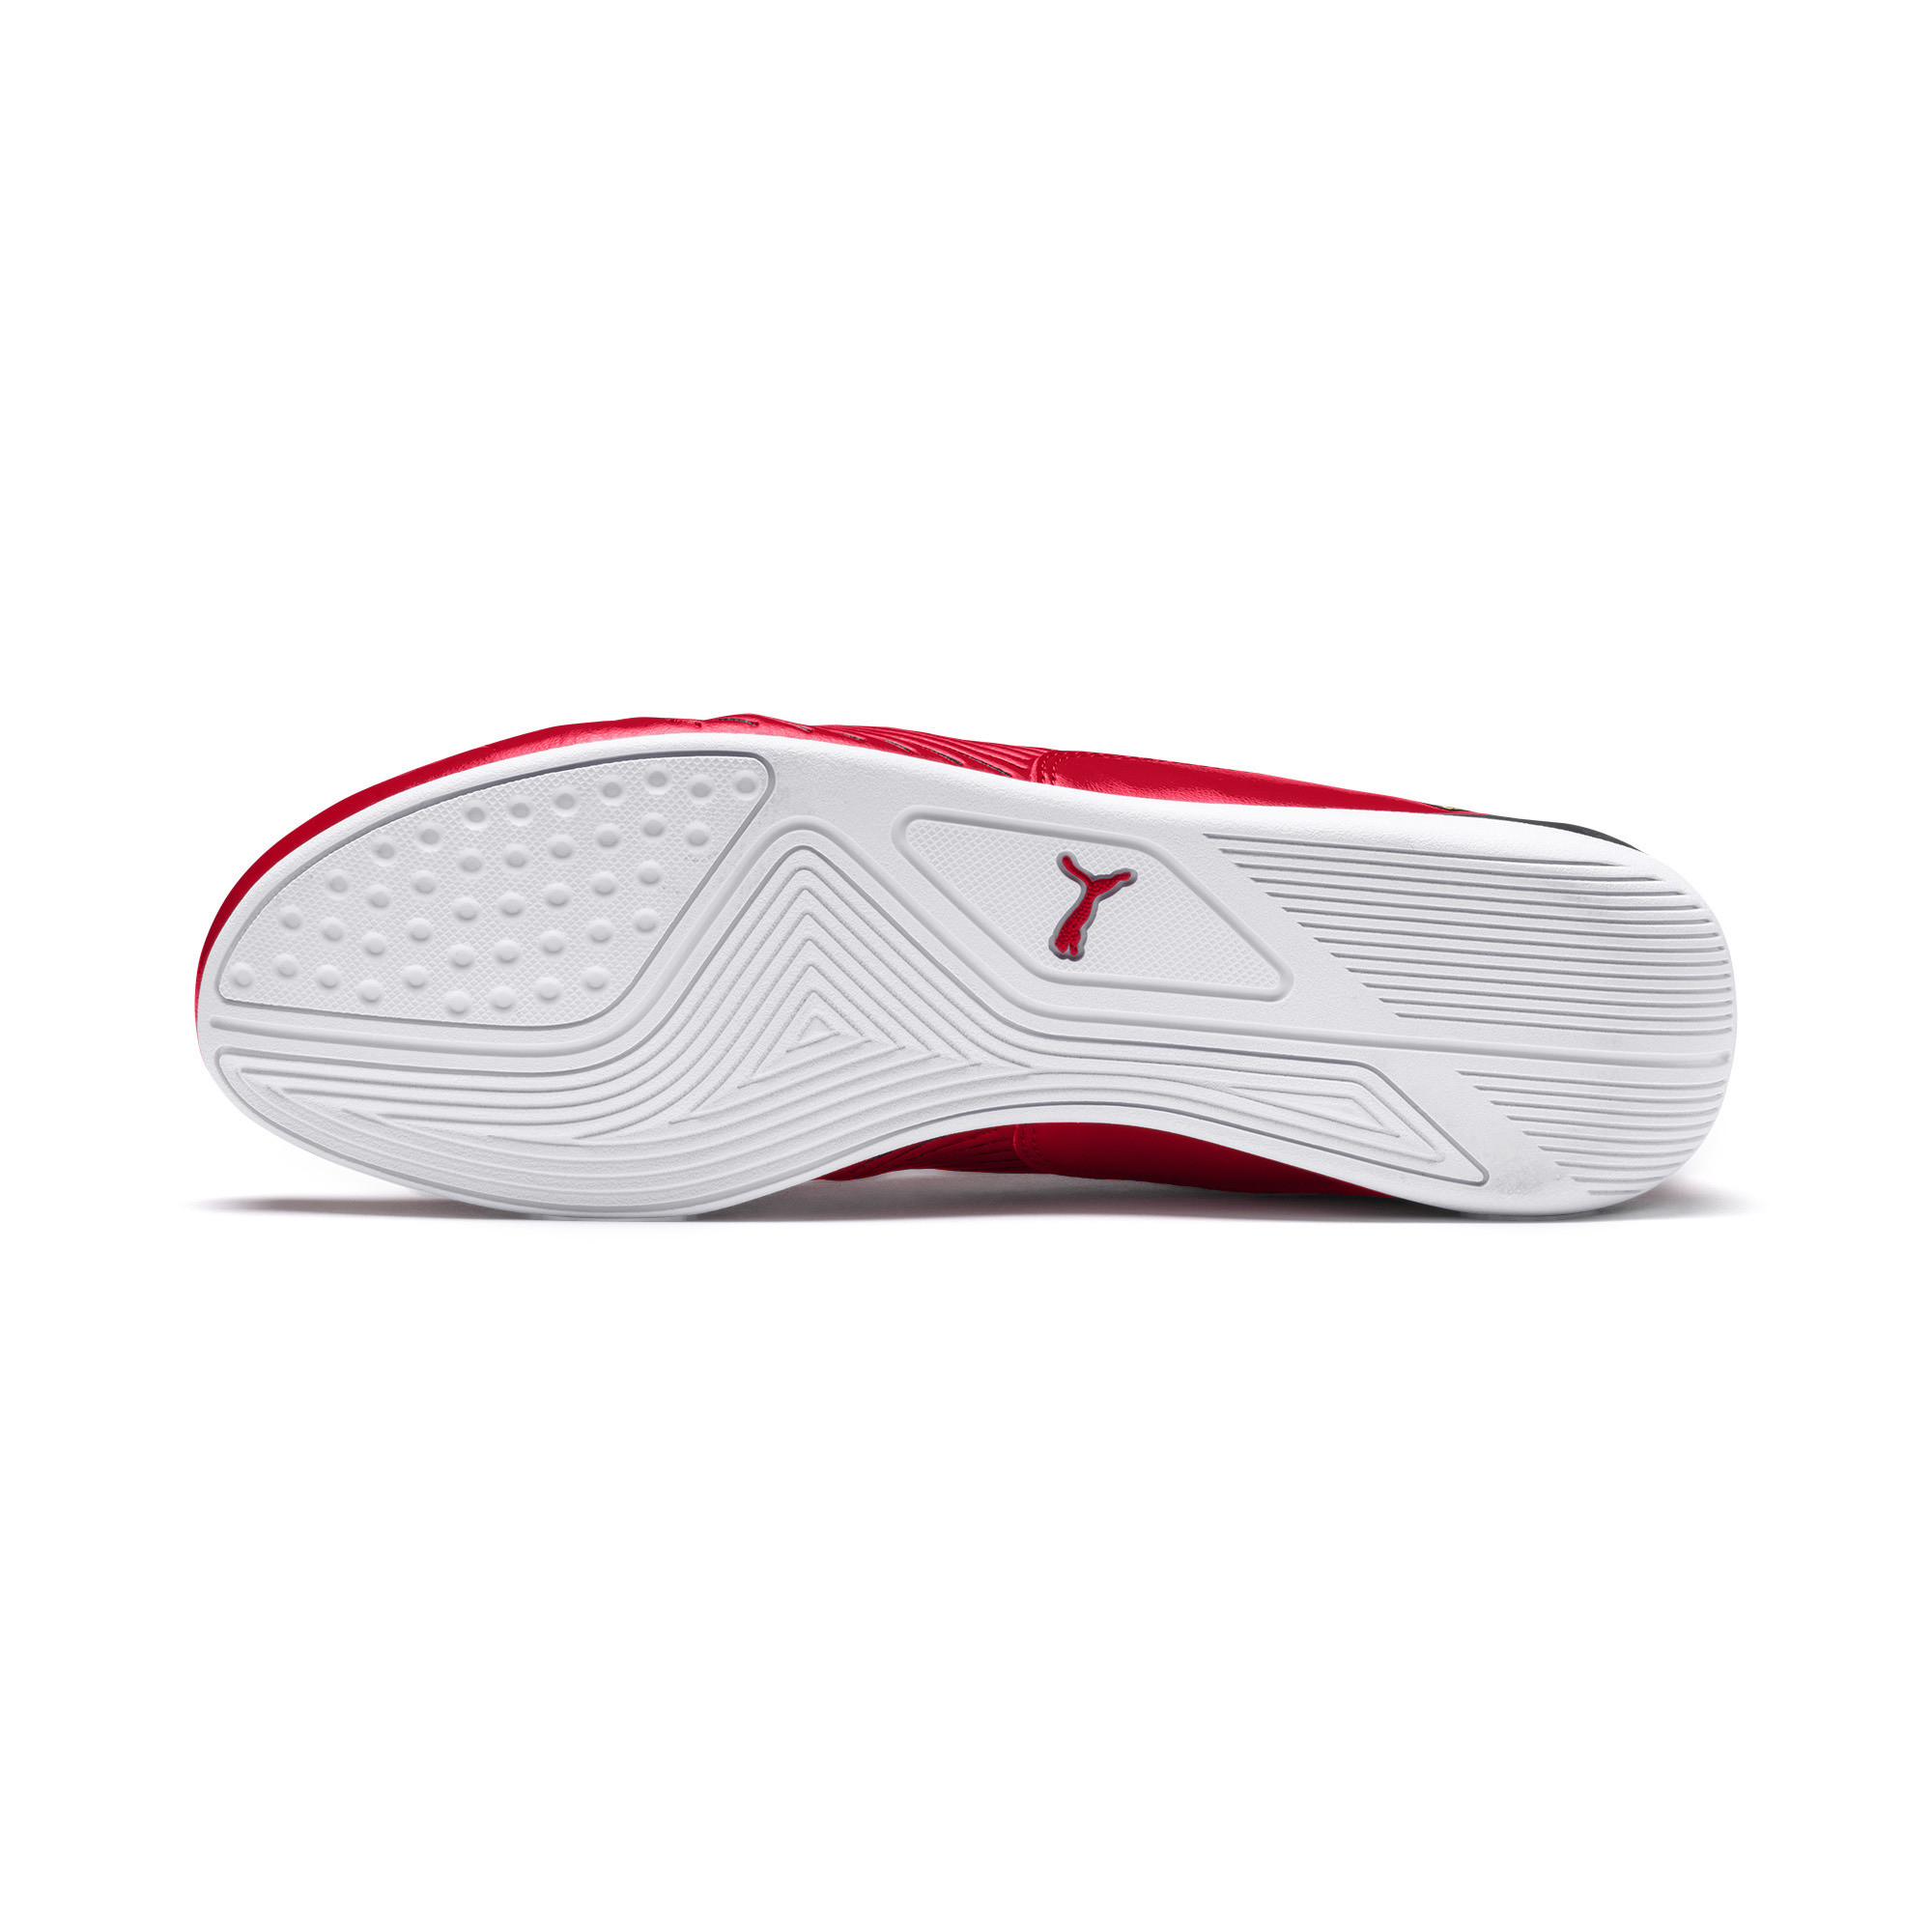 PUMA-Scuderia-Ferrari-Drift-Cat-7S-Ultra-Men-039-s-Shoes-Men-Shoe-Auto thumbnail 11